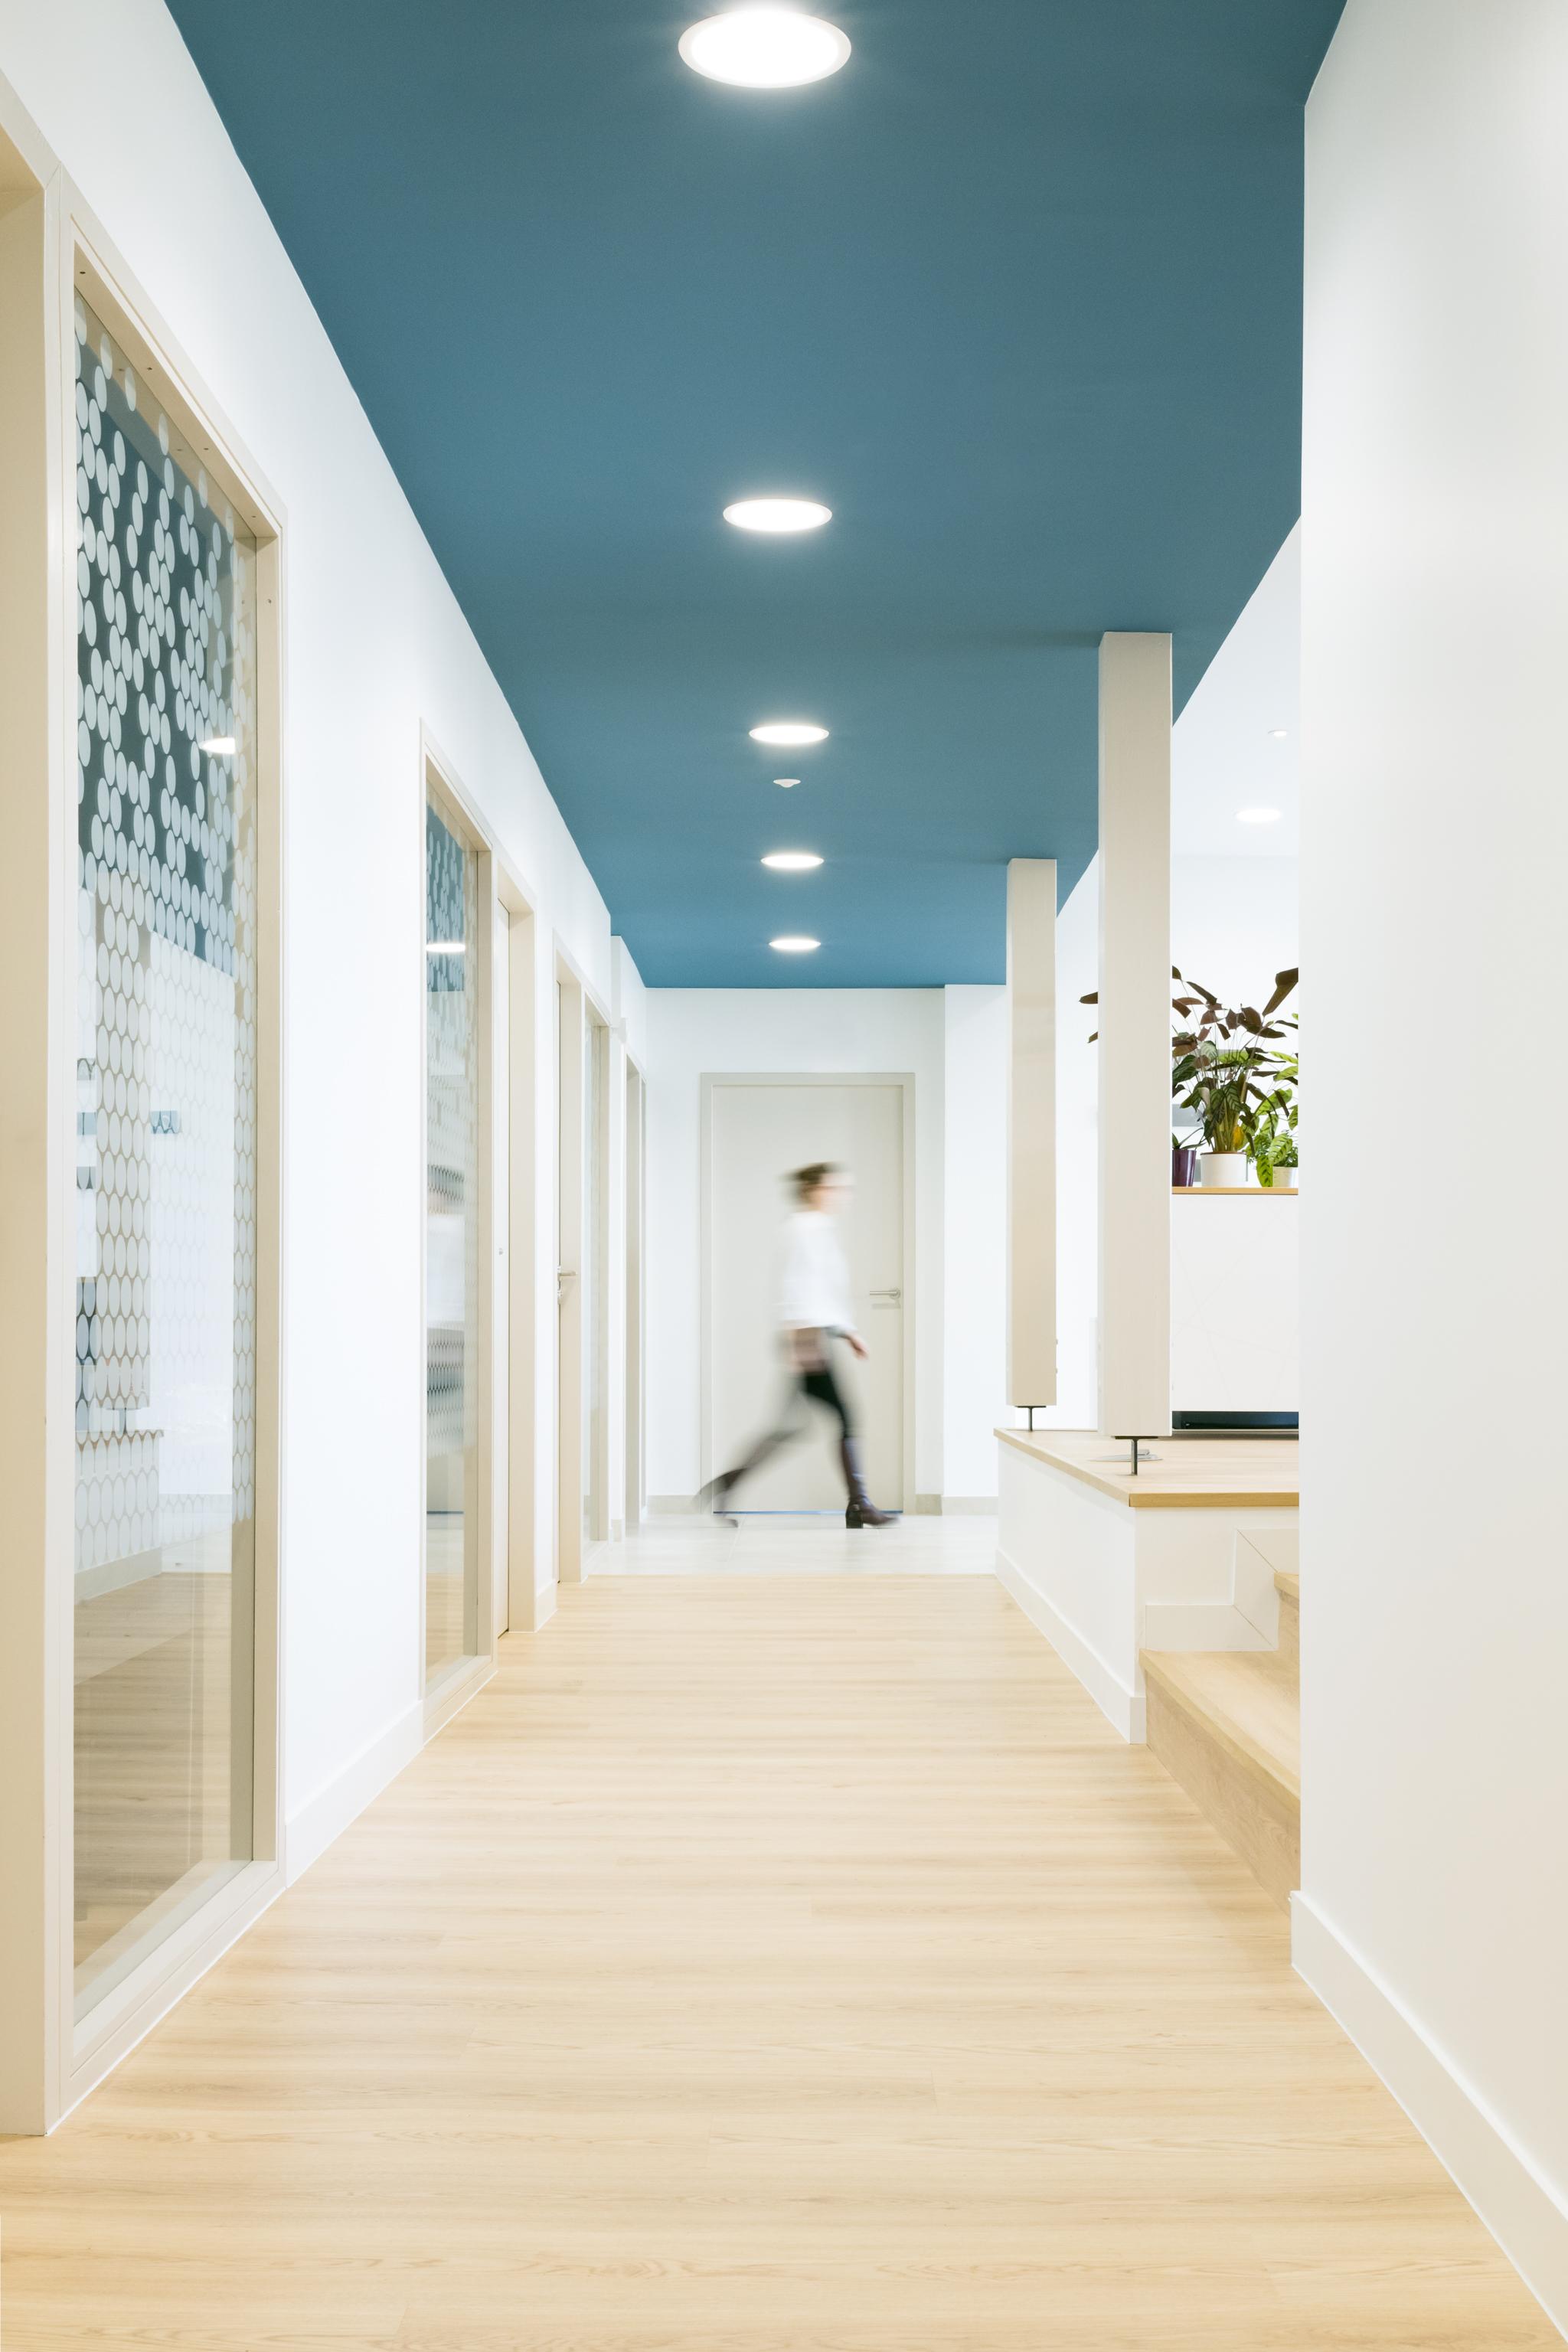 Office Notarial Guémené-Penfao Rennes (35) Maro Architectes construction 5.jpg